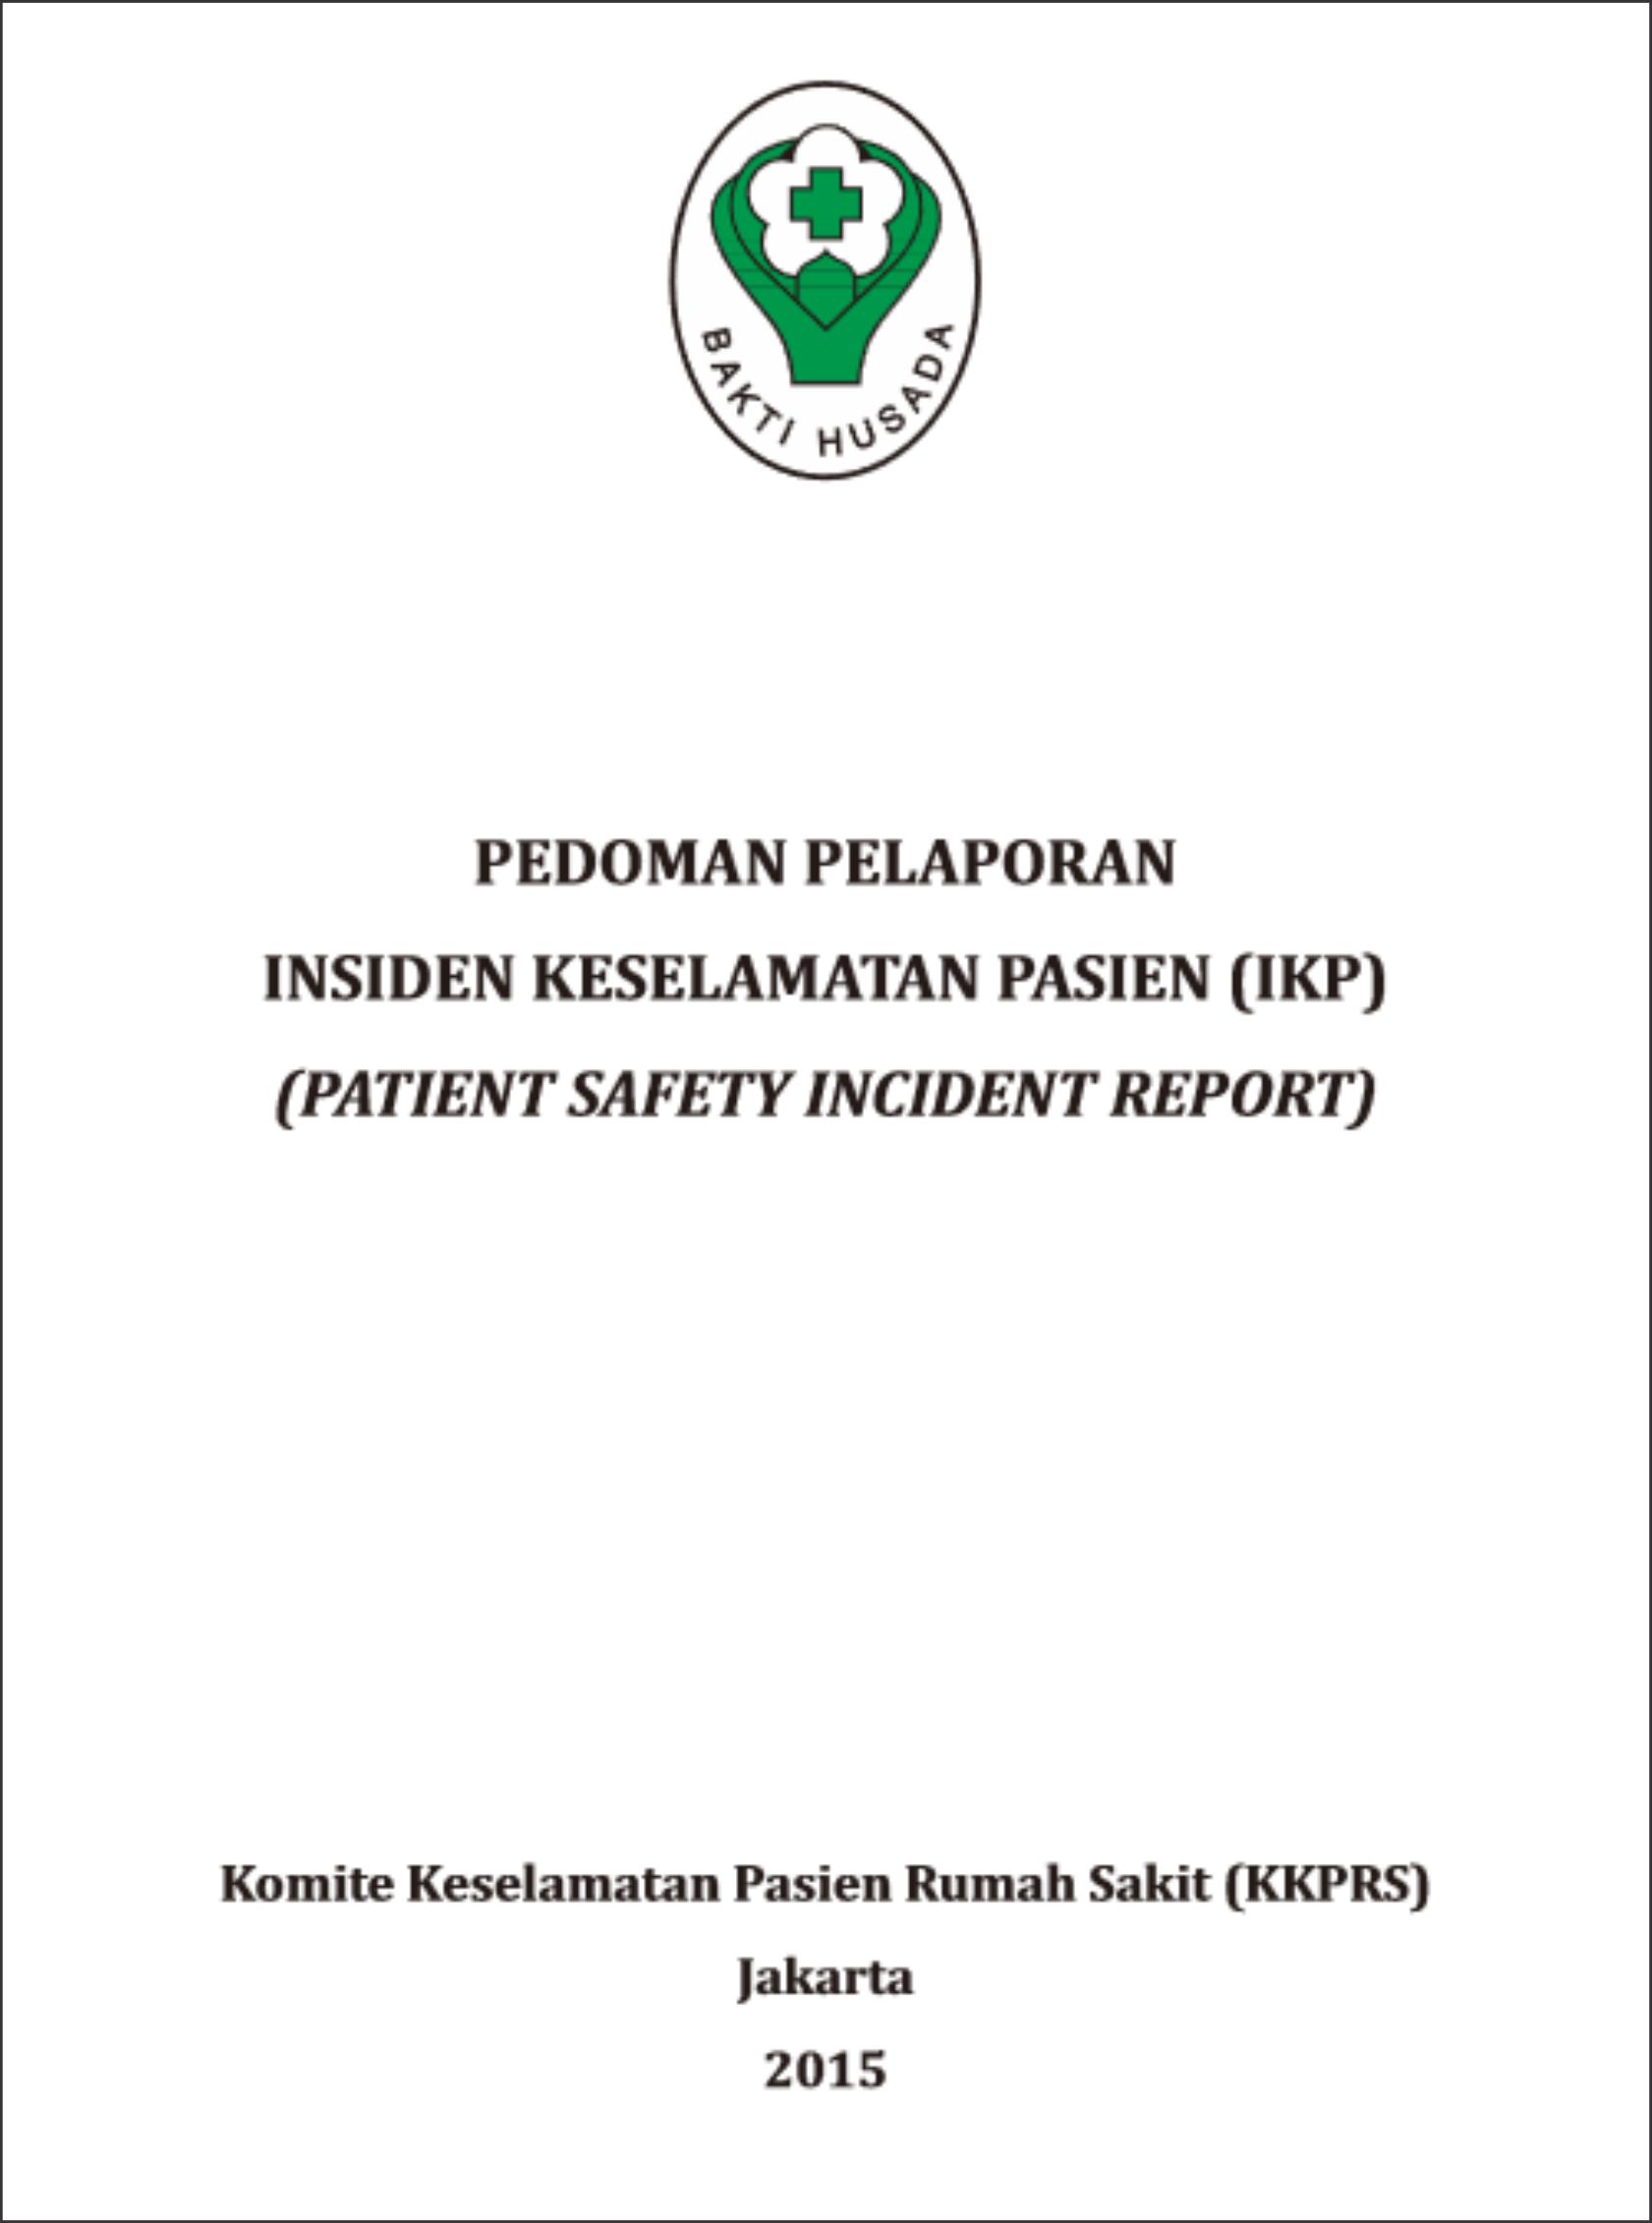 Pedoman Pelayanan Insiden Keselamatan Pasien (IKP)